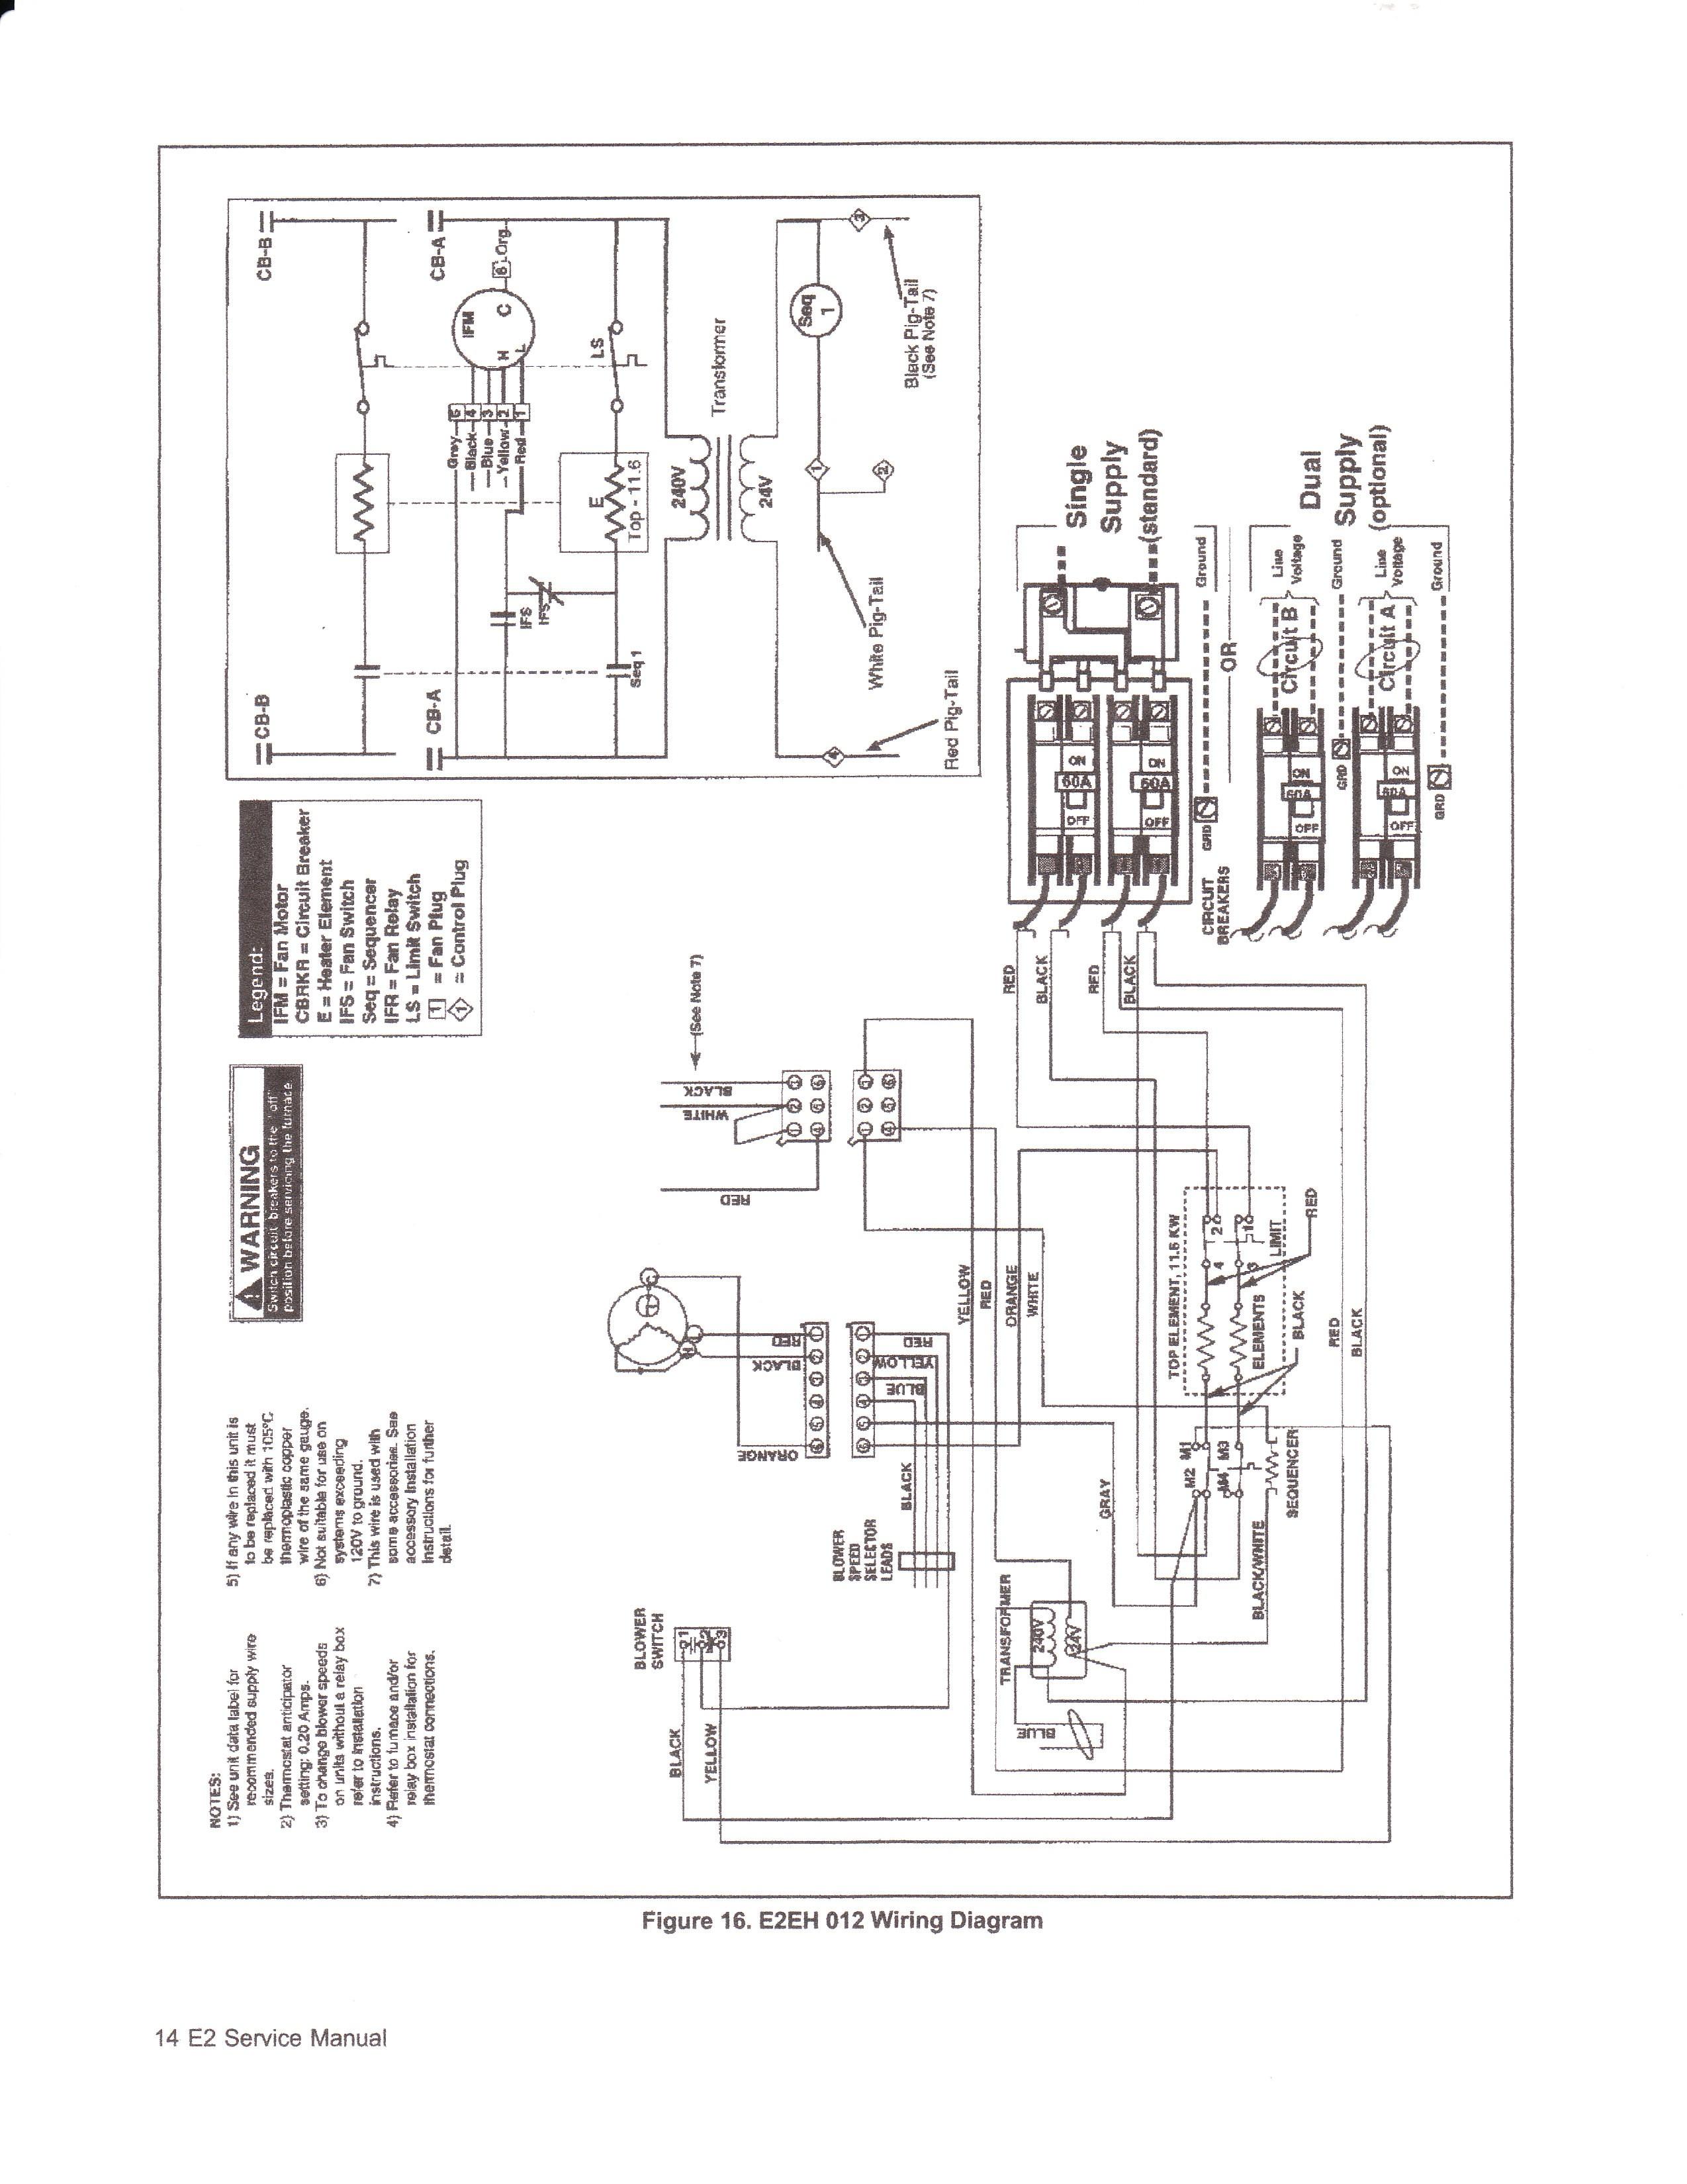 Intertherm Electric Furnace Wiring Diagram with Wiring Furnace Wiring Diagram Fresh Best Wiring Diagram Od